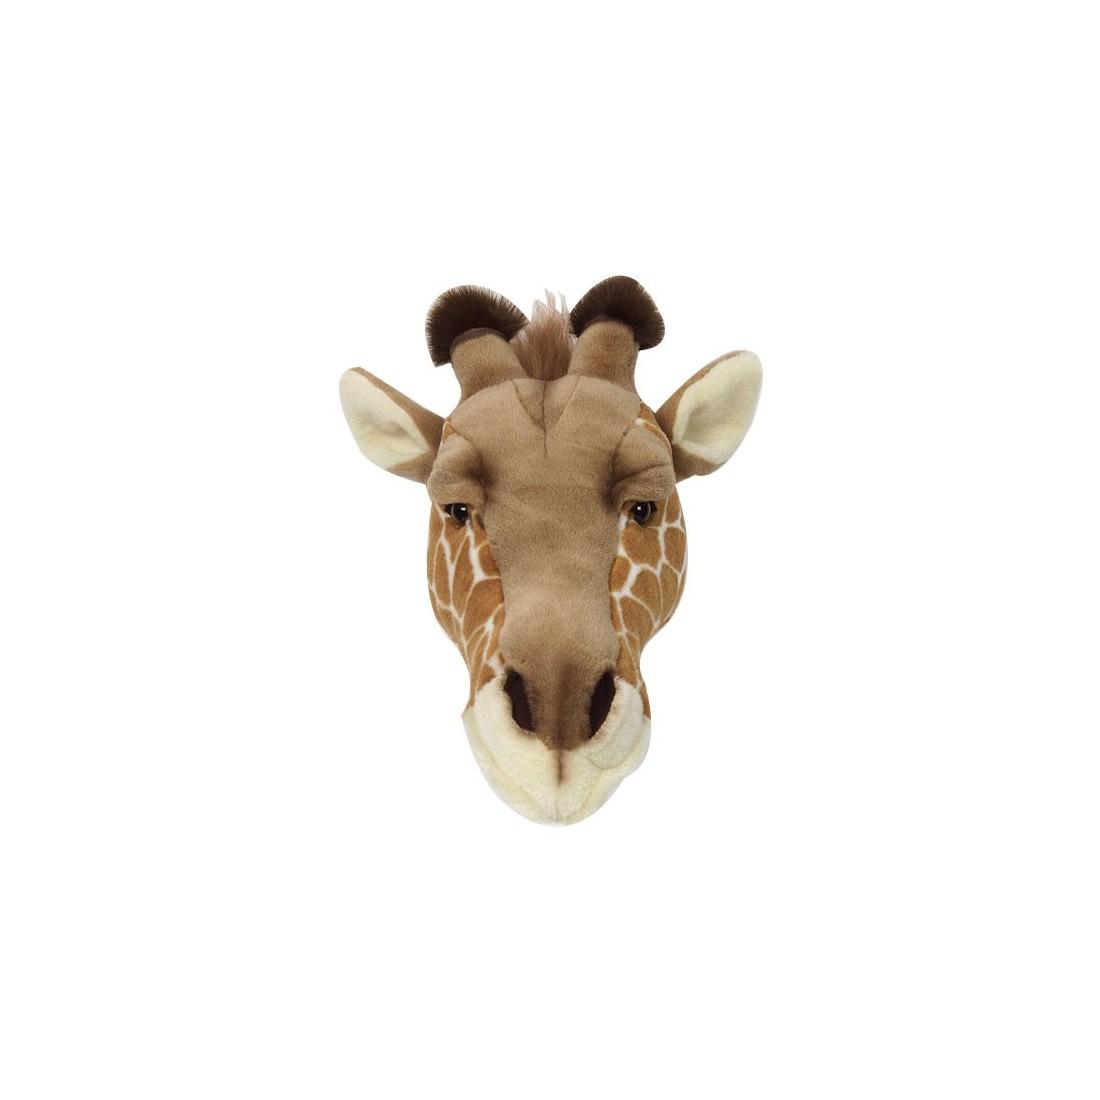 d co murale enfant peluche t te de girafe bibib ma. Black Bedroom Furniture Sets. Home Design Ideas